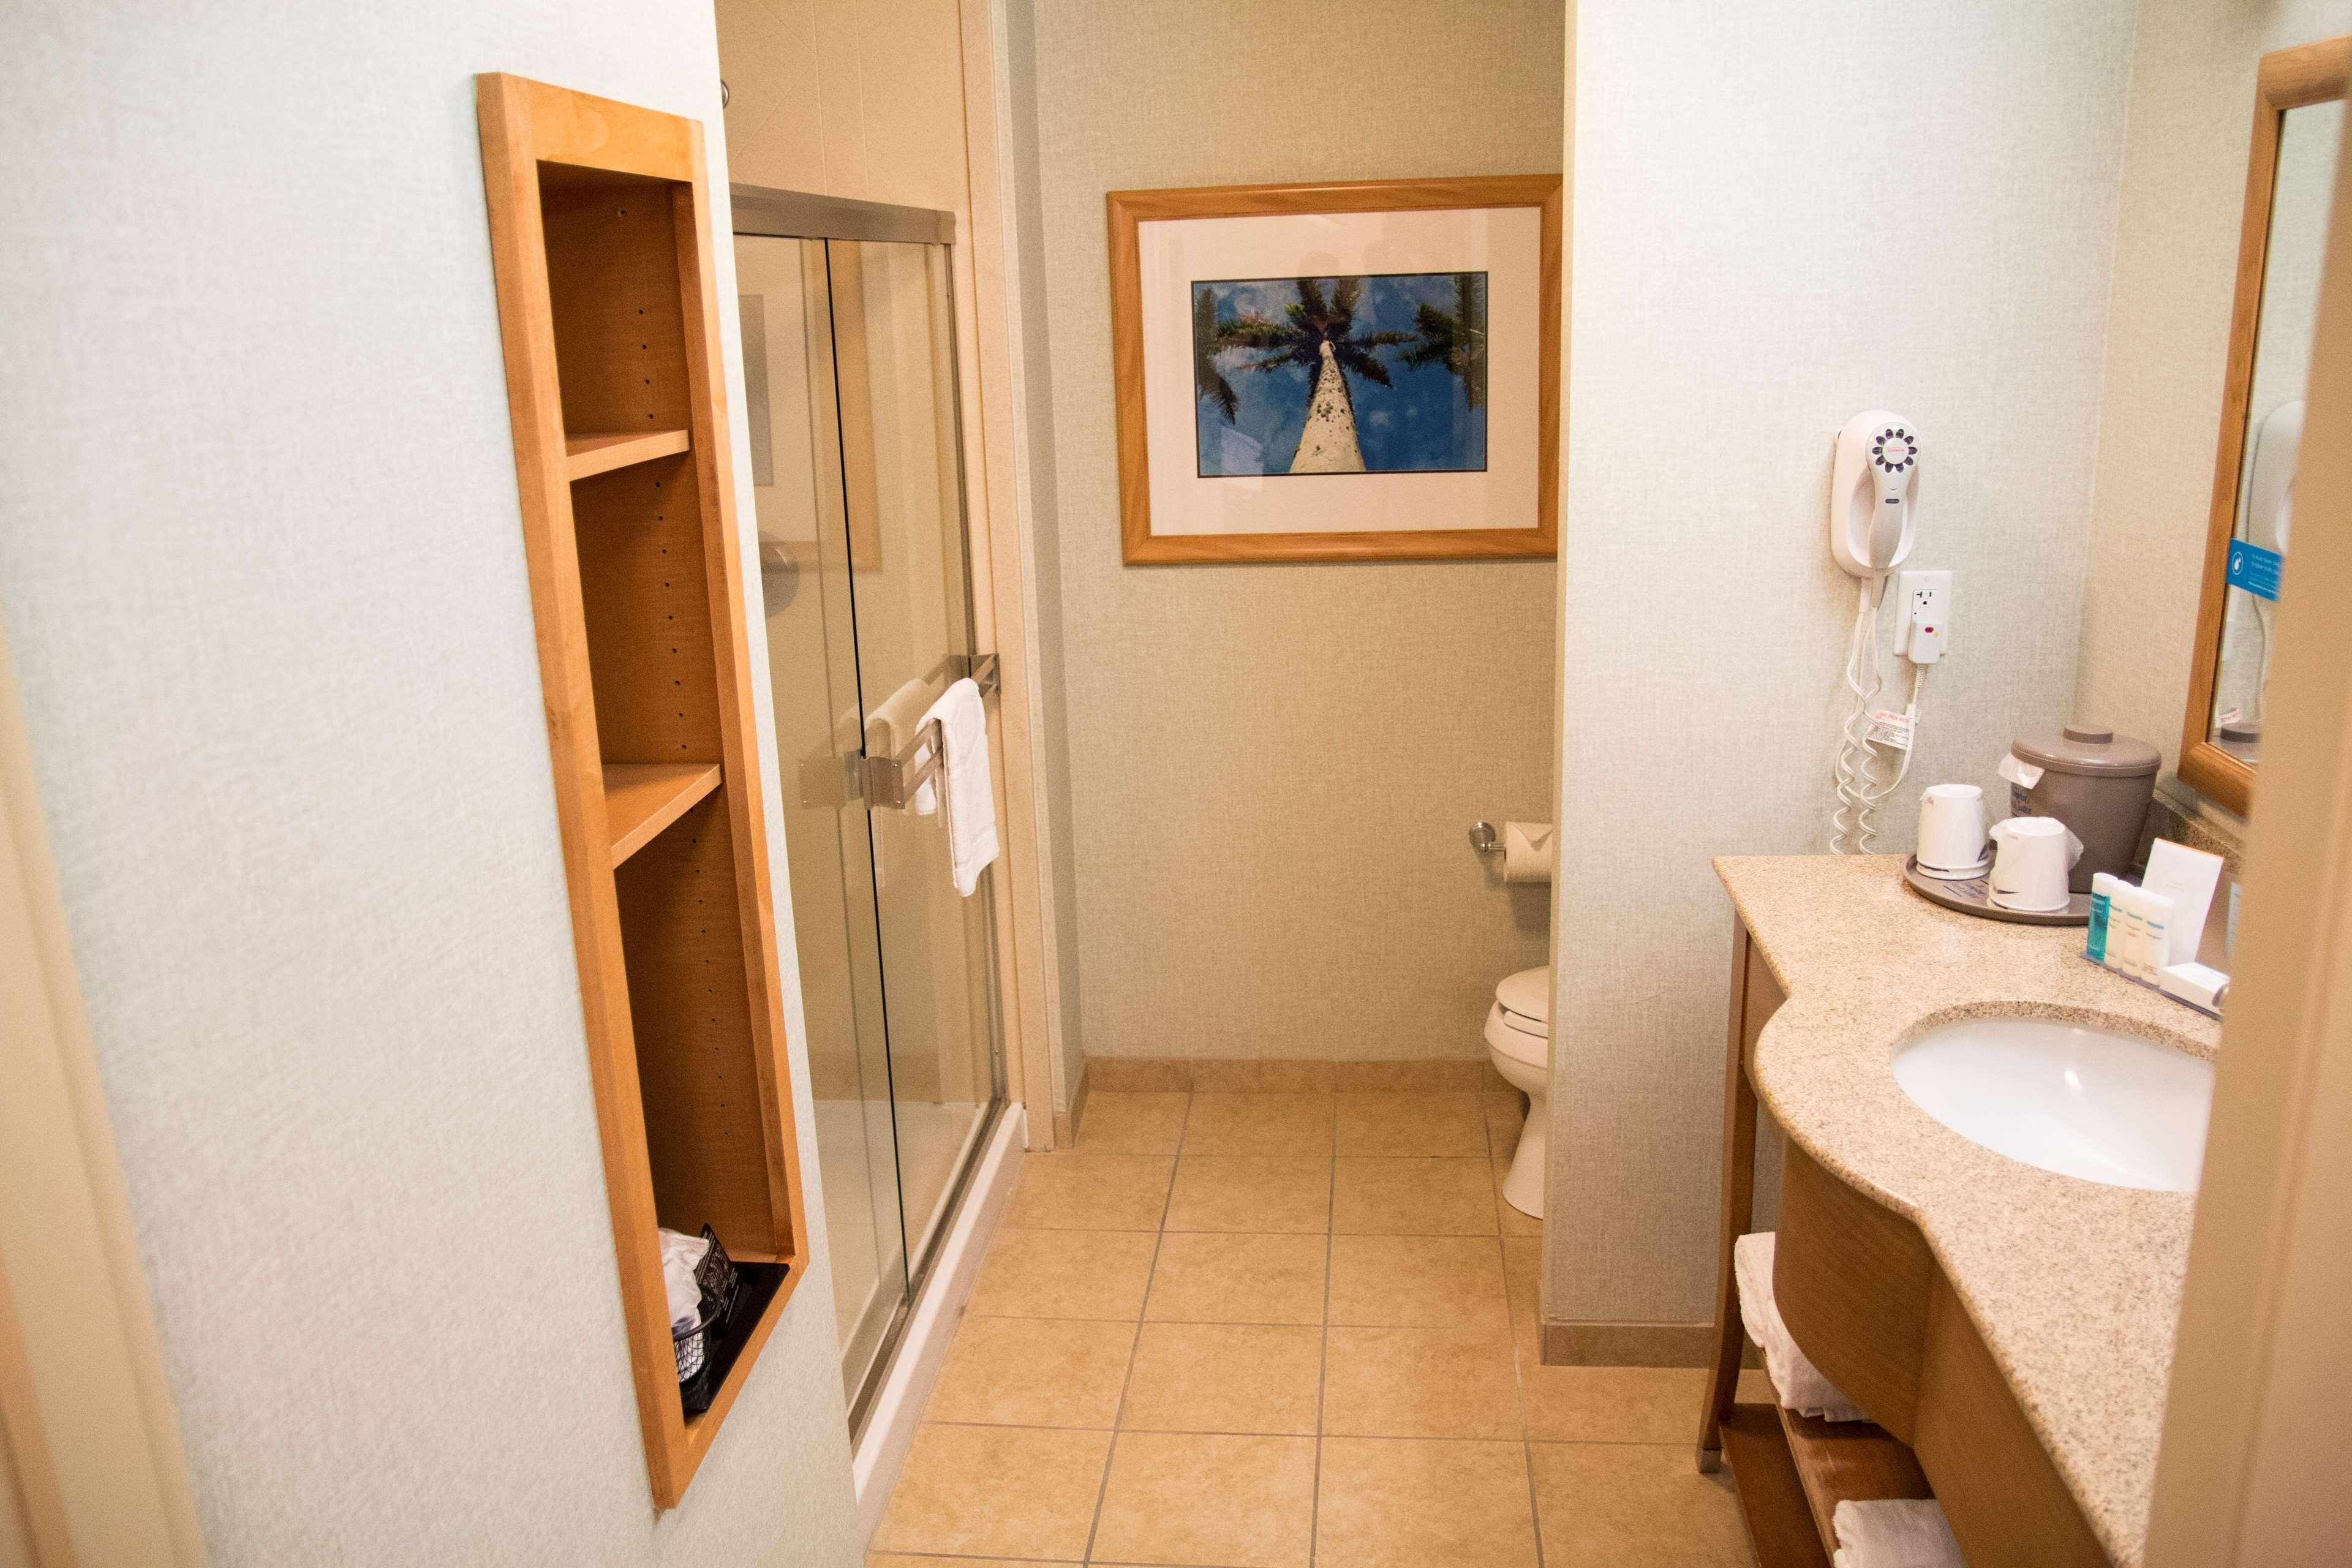 Hampton Inn & Suites Madera image 35